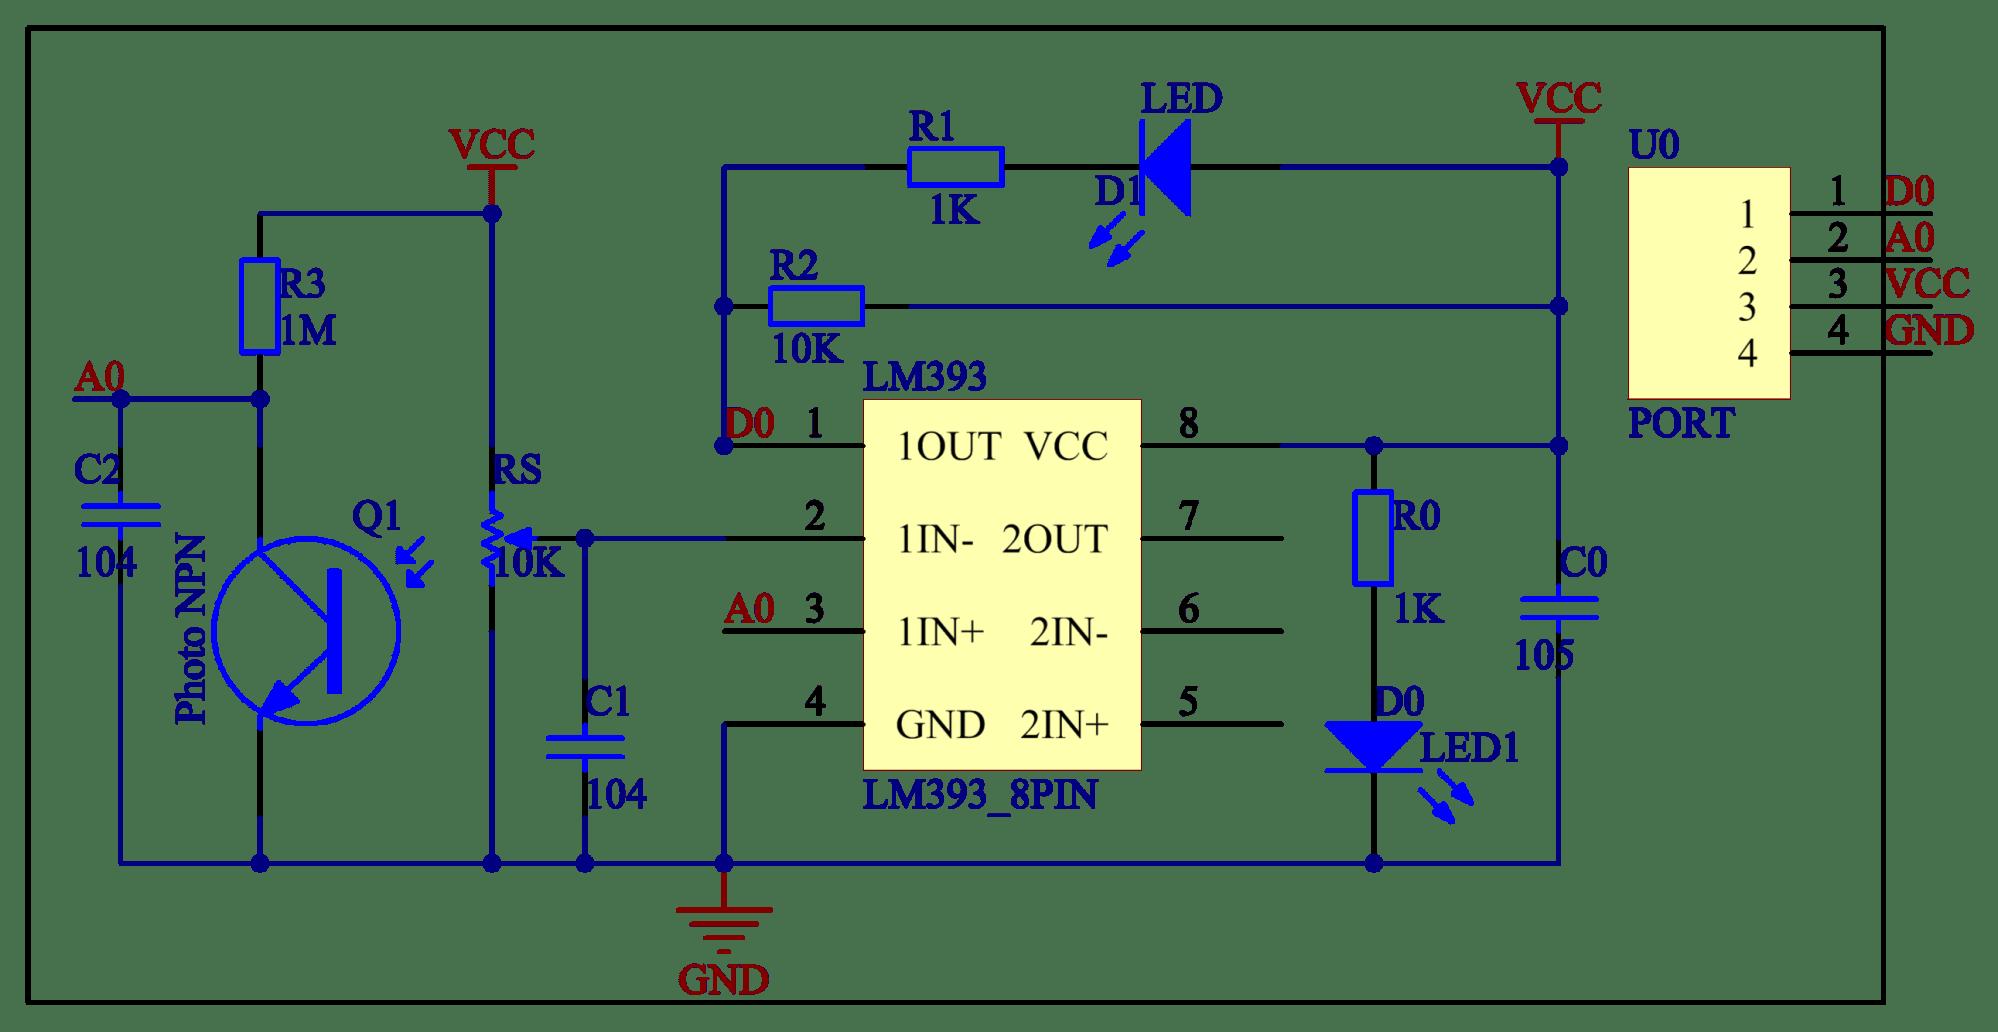 hight resolution of arduino flame sensor interface arduino flame sensor circuit diagram flame sensor circuit diagram fdsfassa circuit diagram